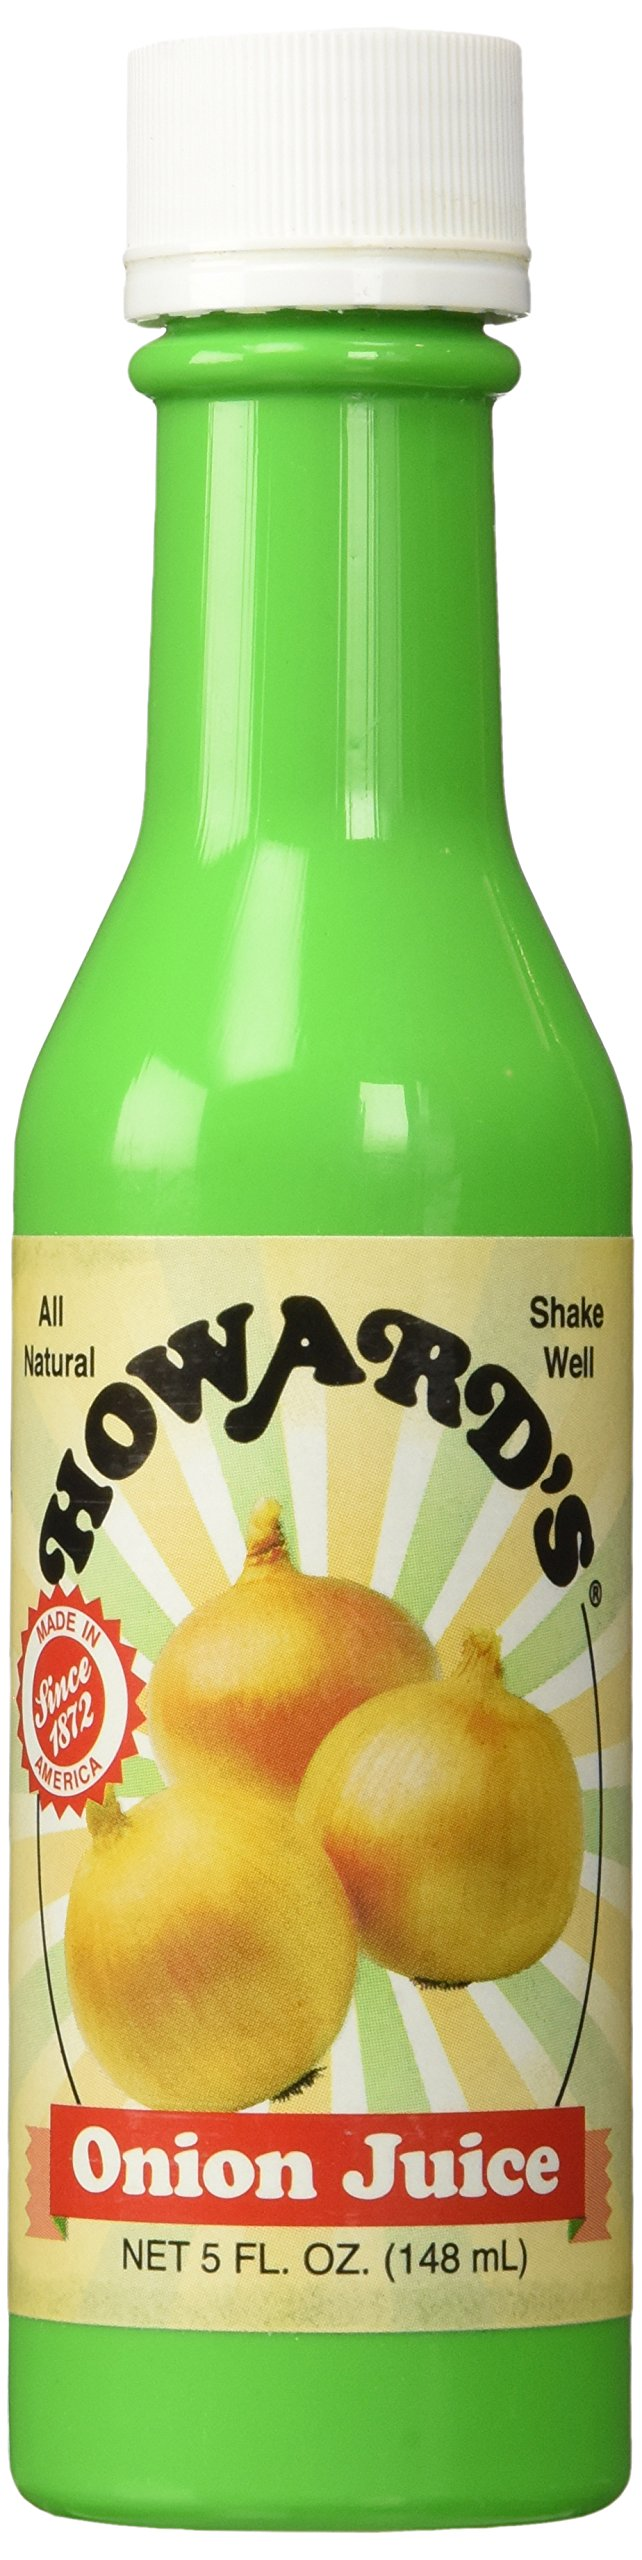 Howards Onion Juice 5-Ounce Bottle, 0.67 Pound